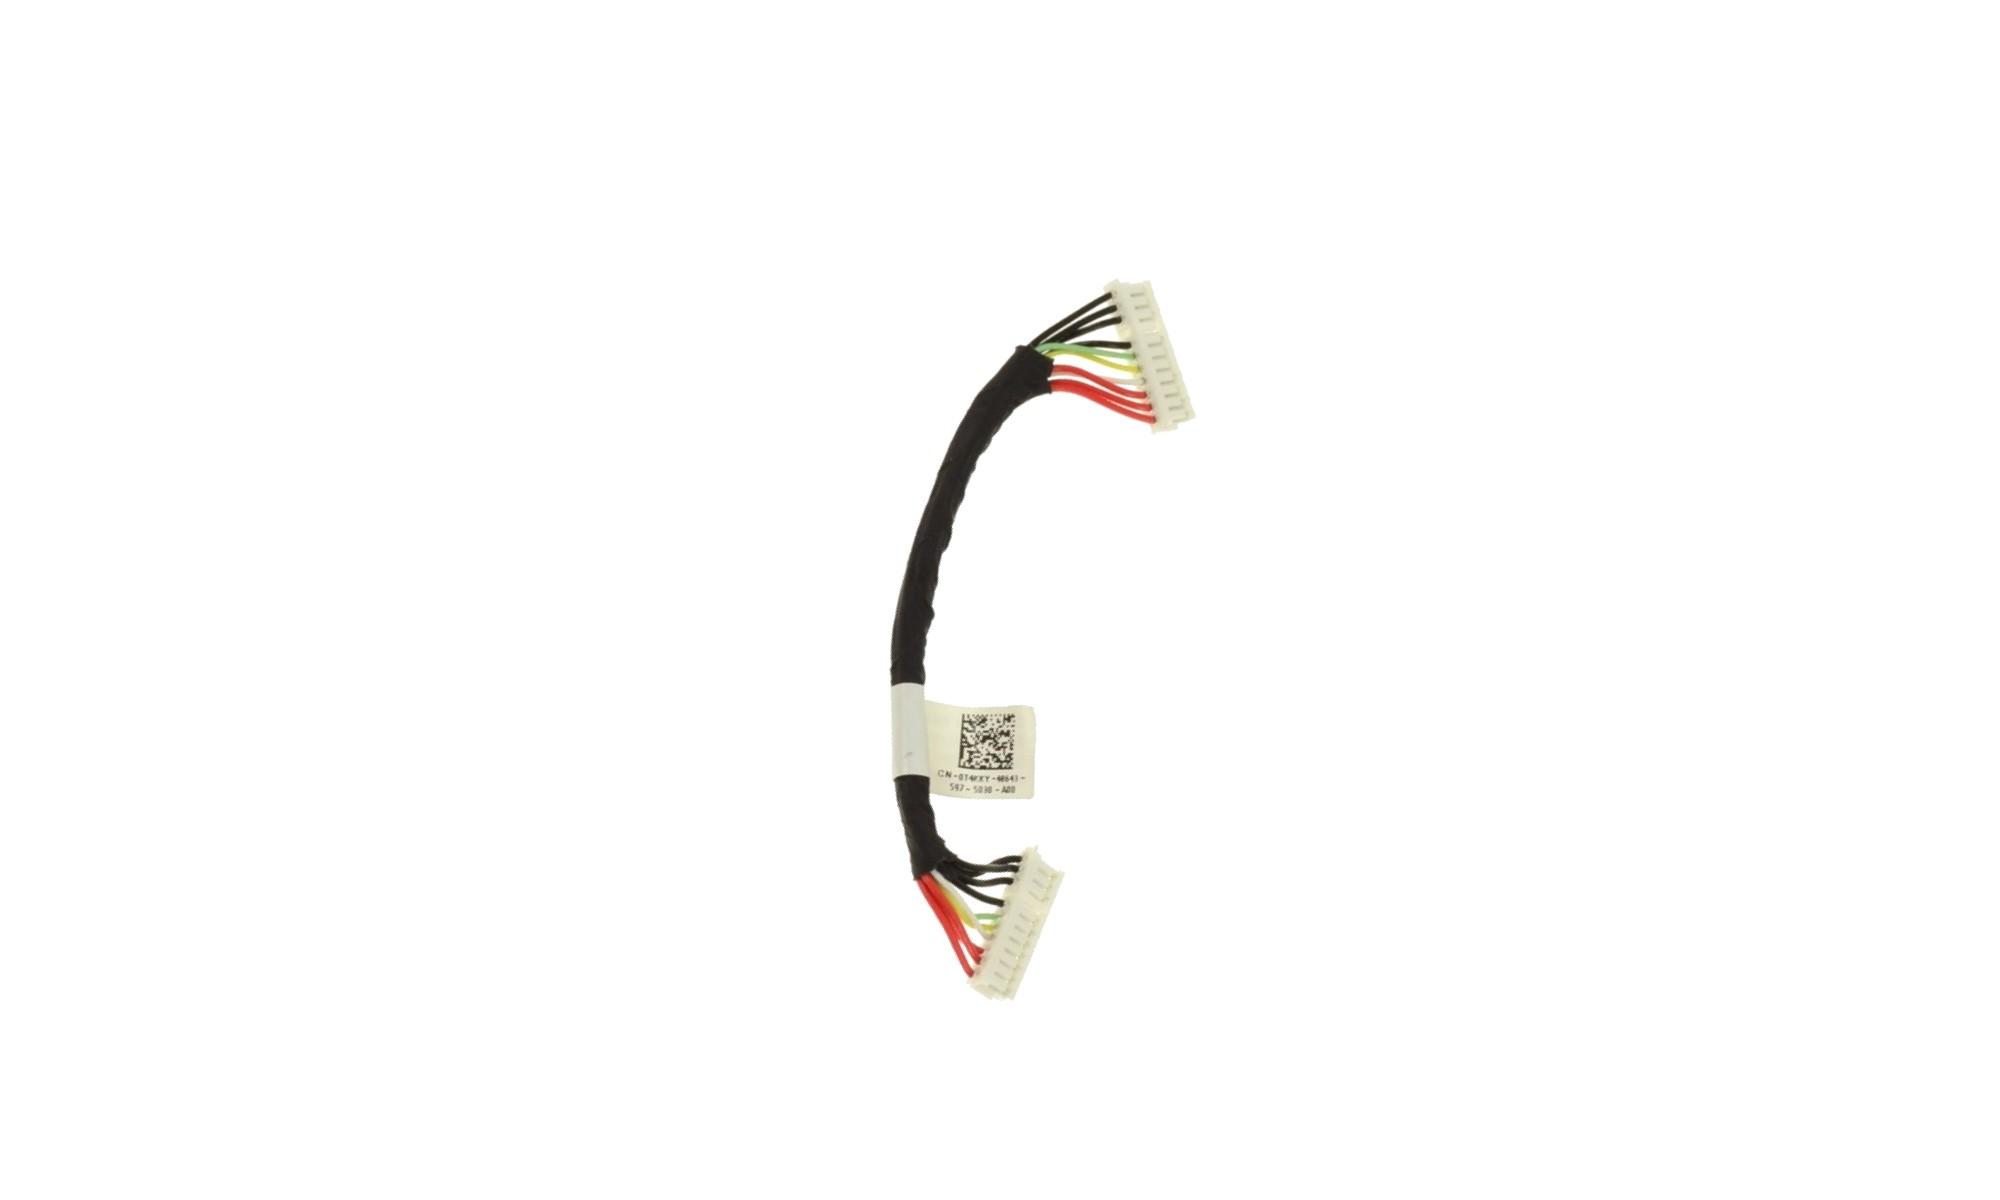 Cablu conectare baterie Dell Inspiron 15 7559, model T4KKY